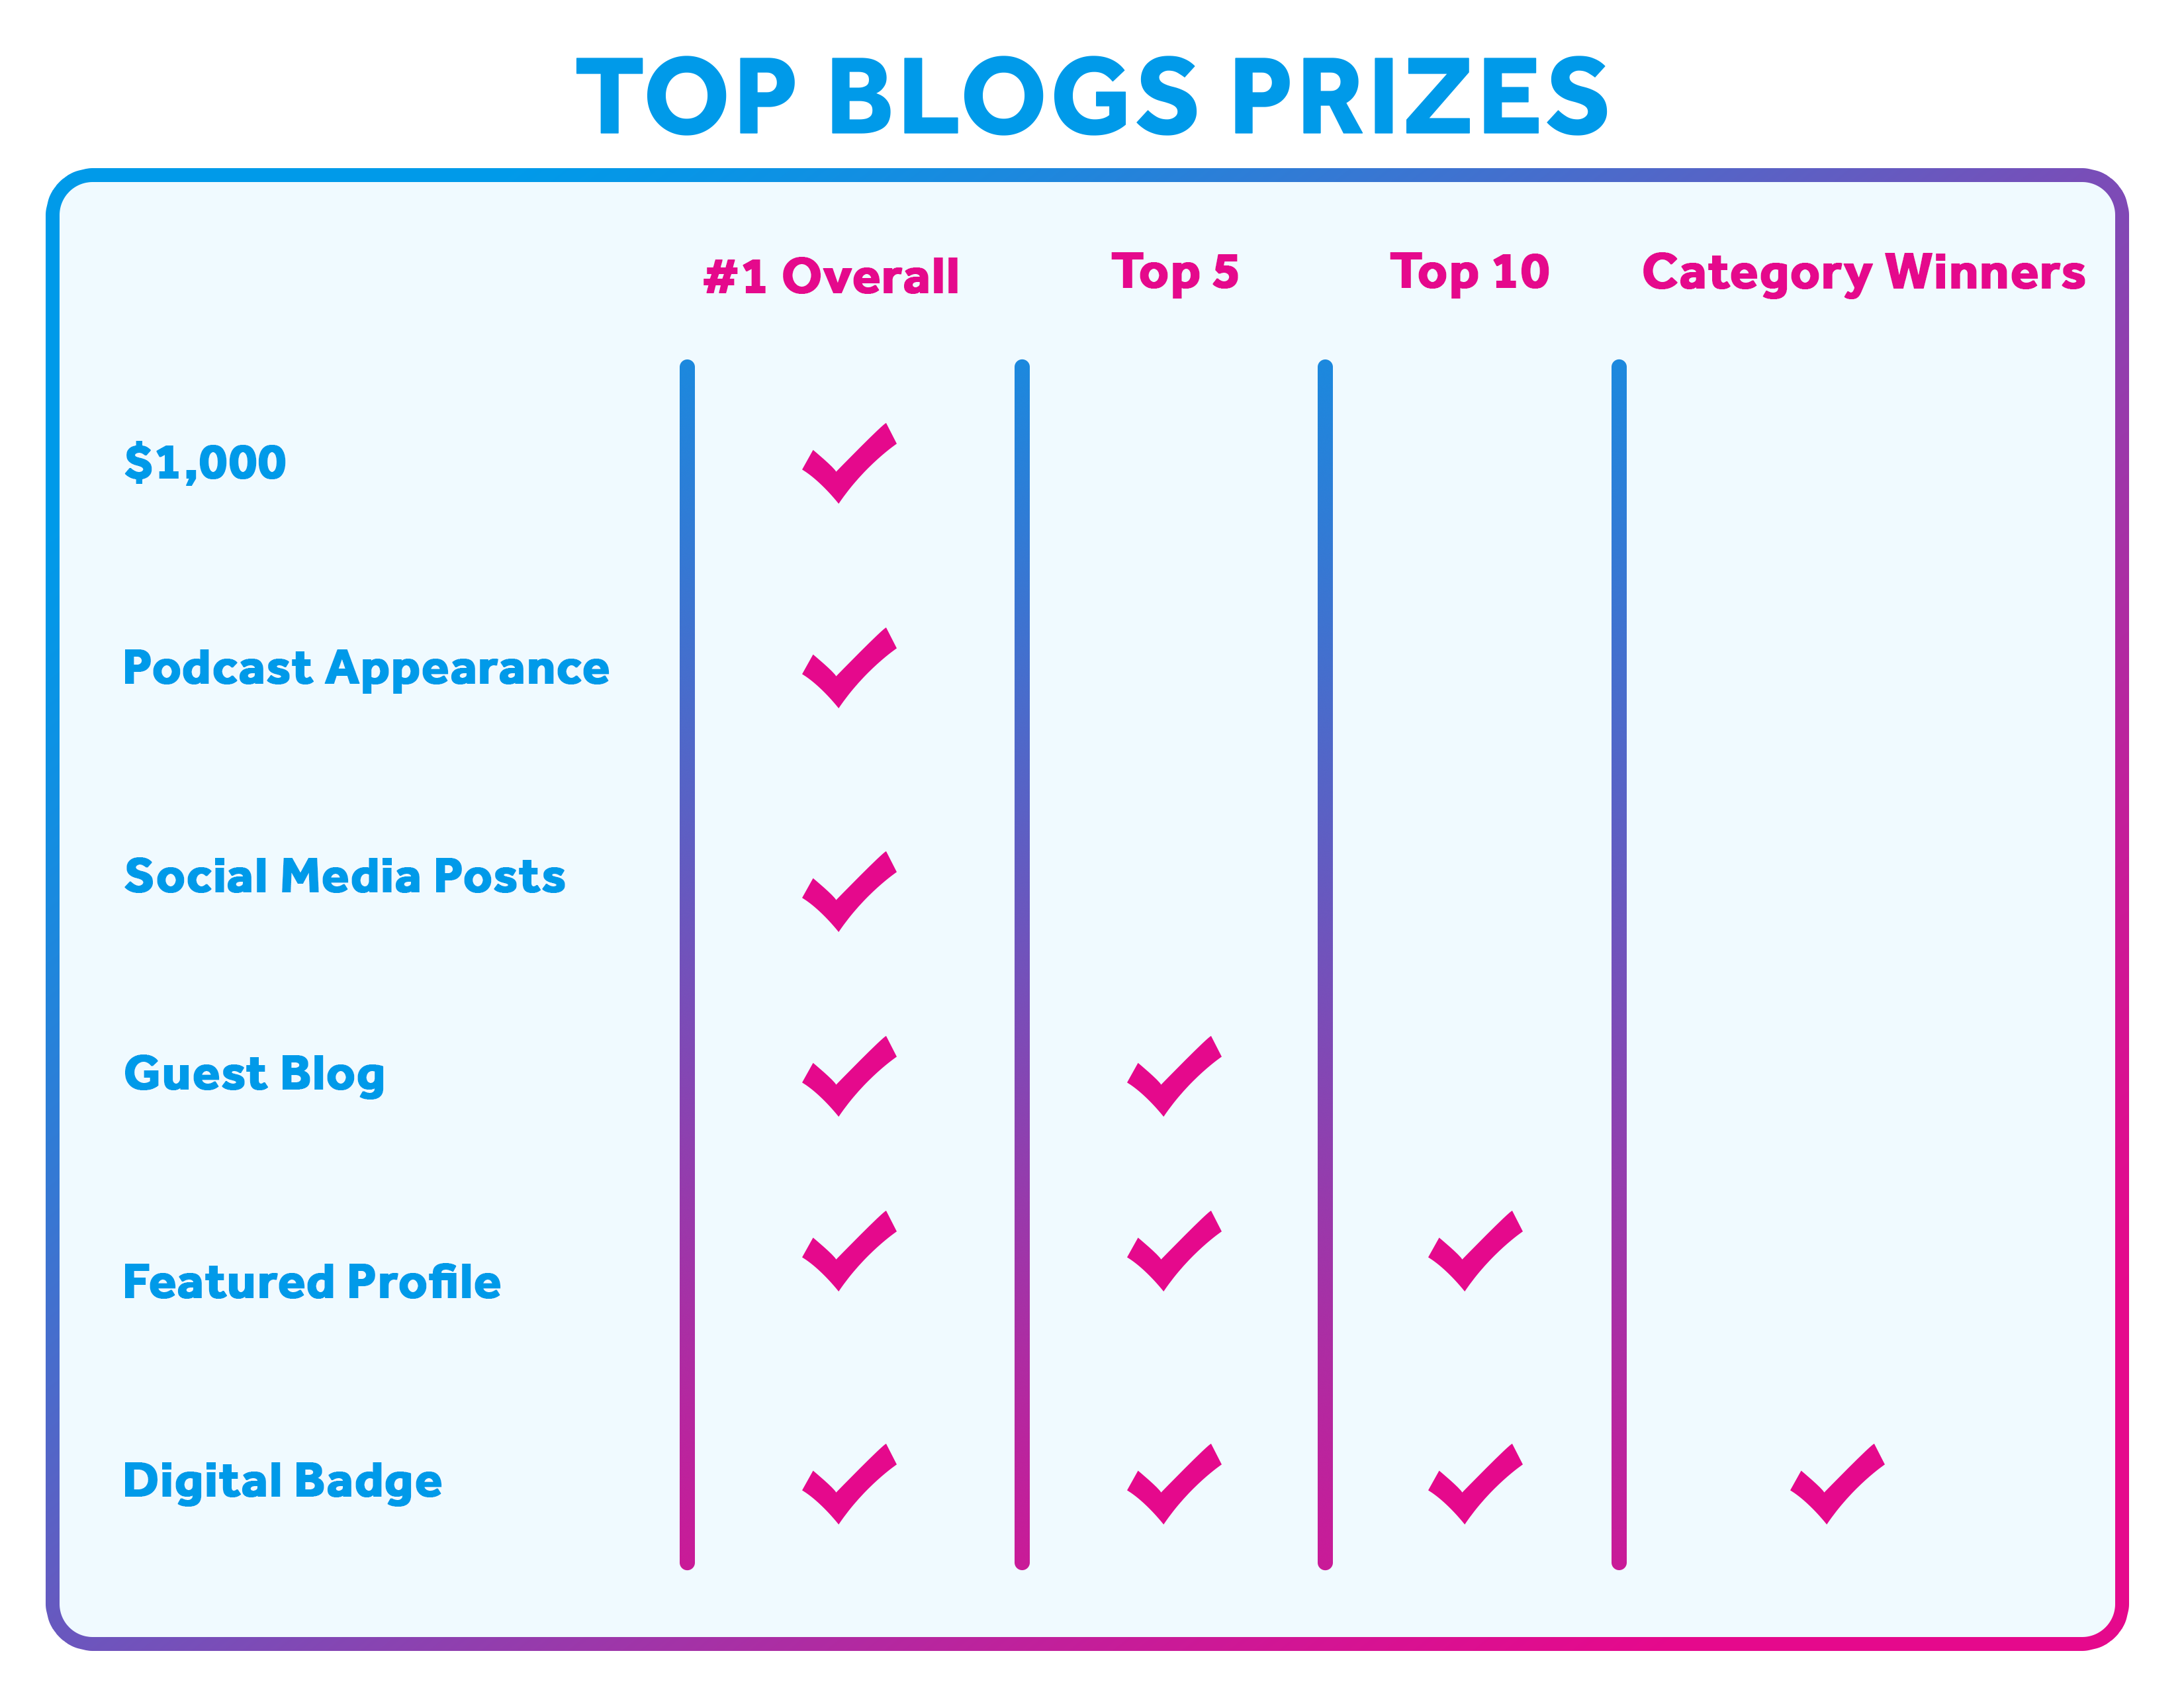 Top Blogs Prizes